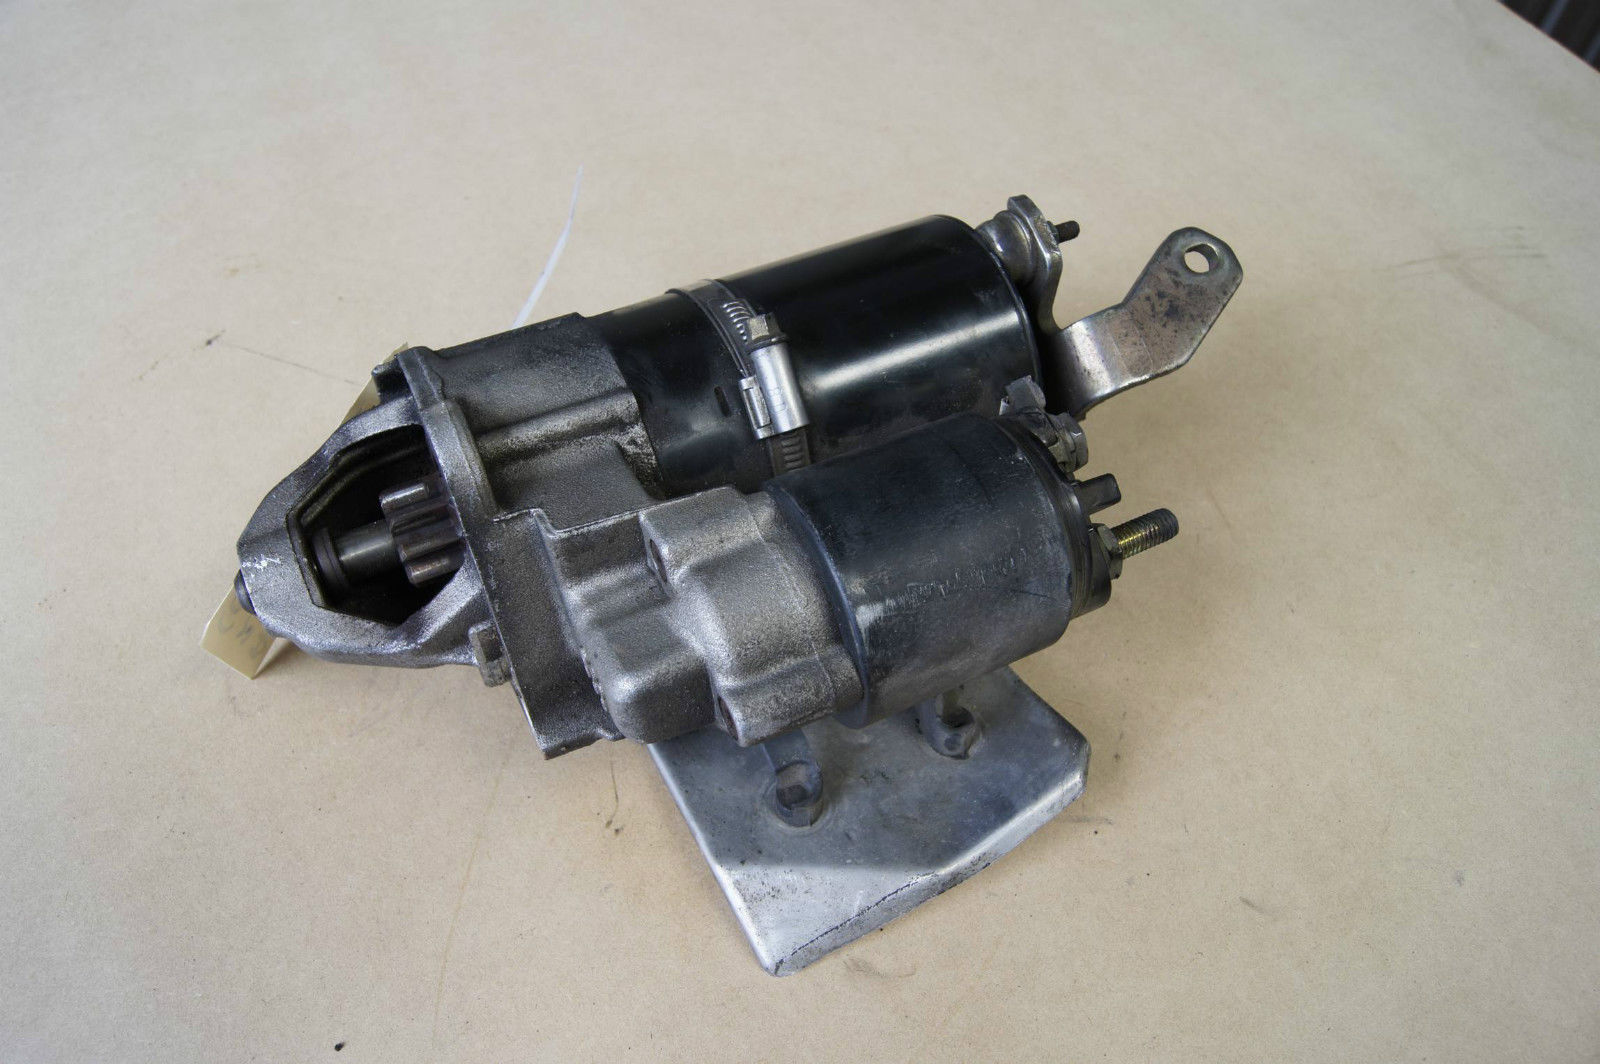 Audi A4 B5 B6 B7 1 8t 2 0 Starter Motor Part 06b 911 023